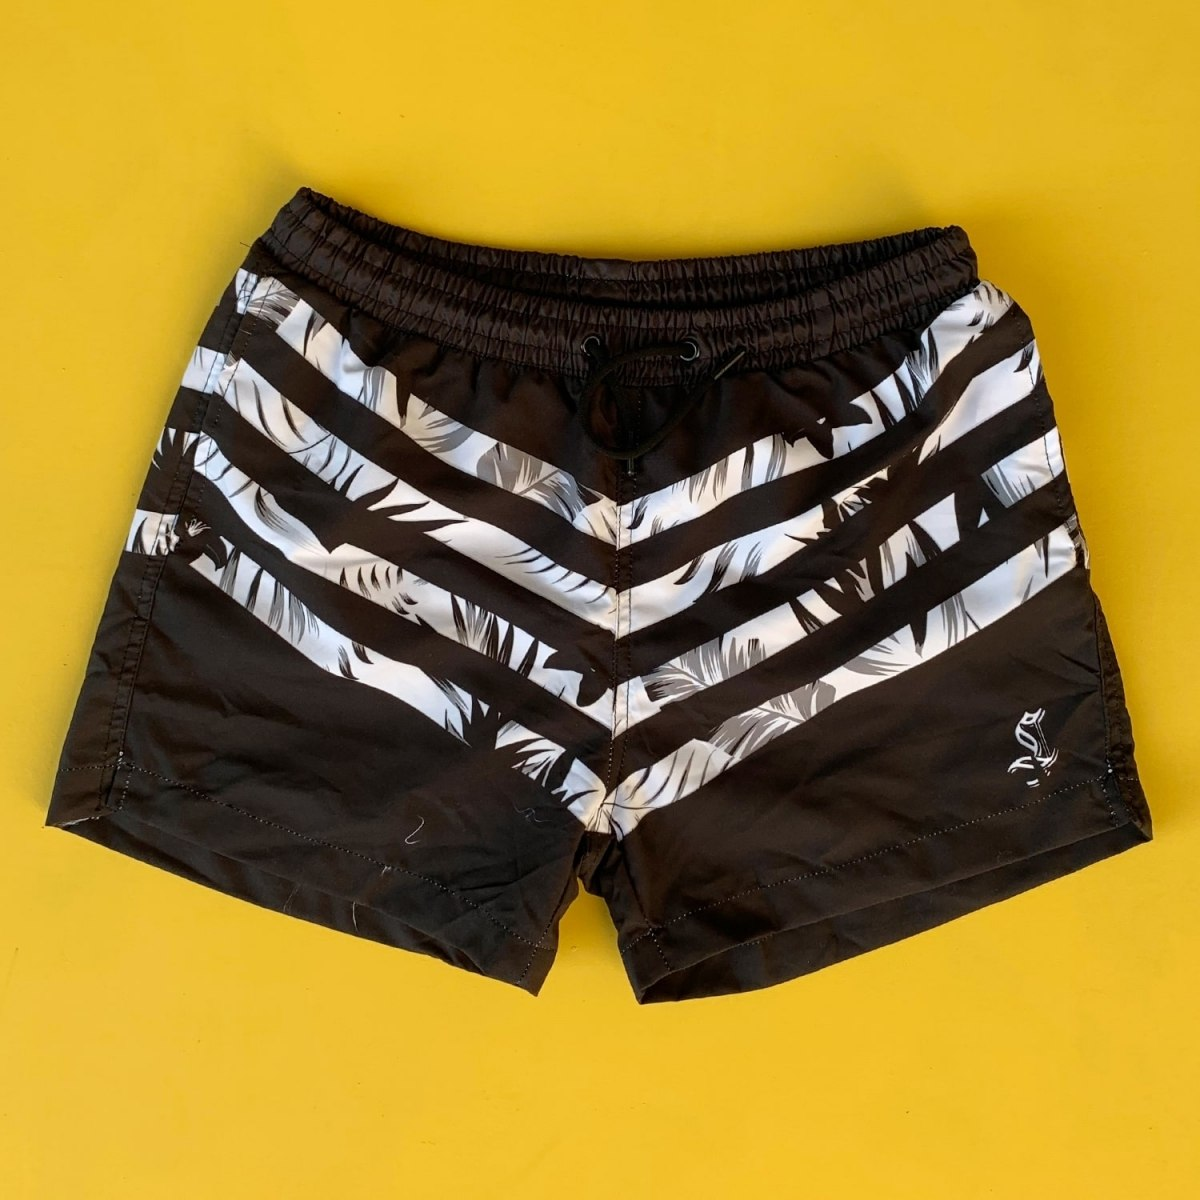 Men's Leaf Pattern Cross Line Short Swim Shorts Black White Mv Premium Brand - 1